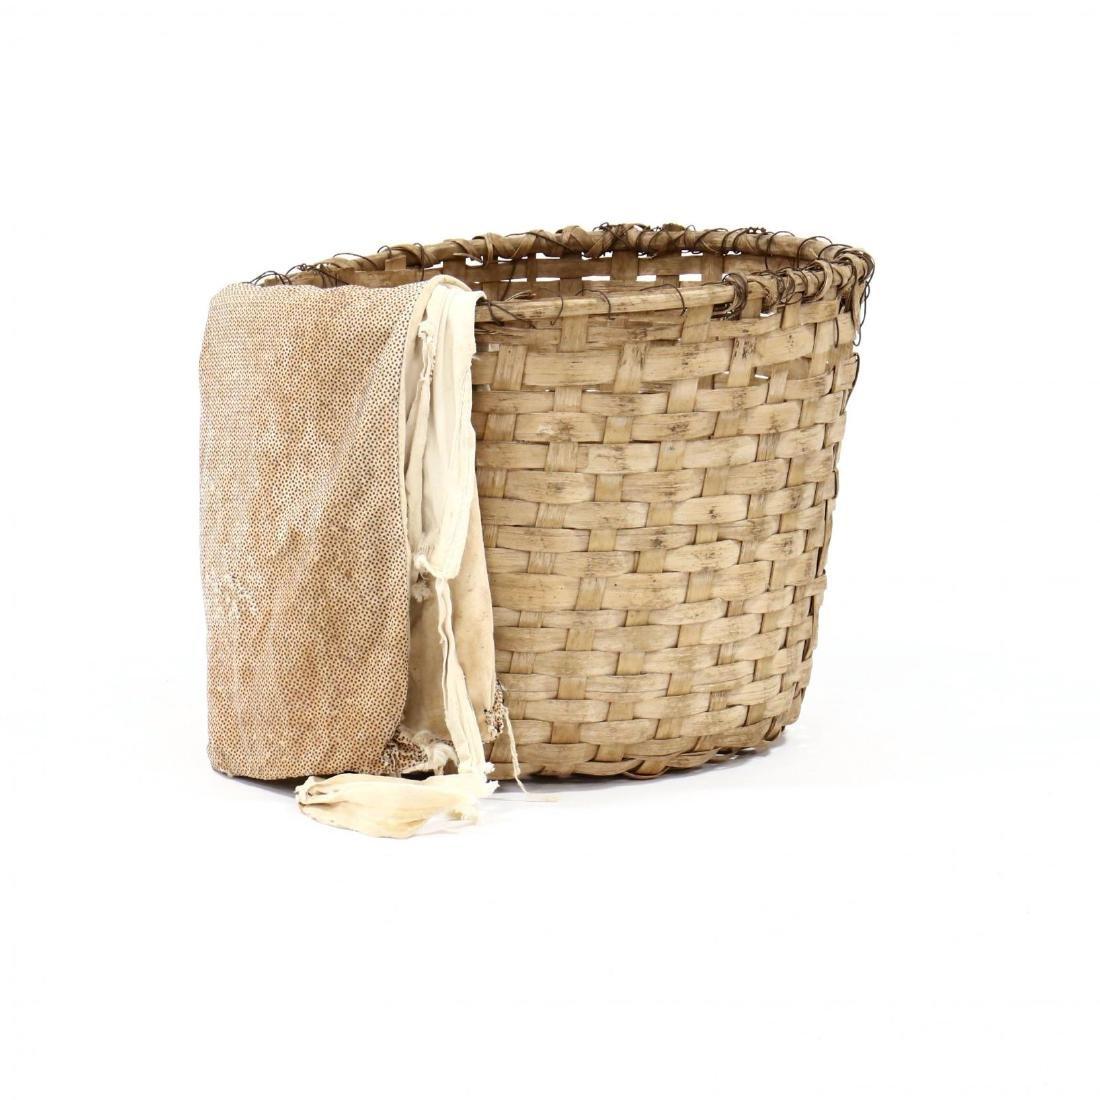 Antique Cotton Picker's Basket and Bag